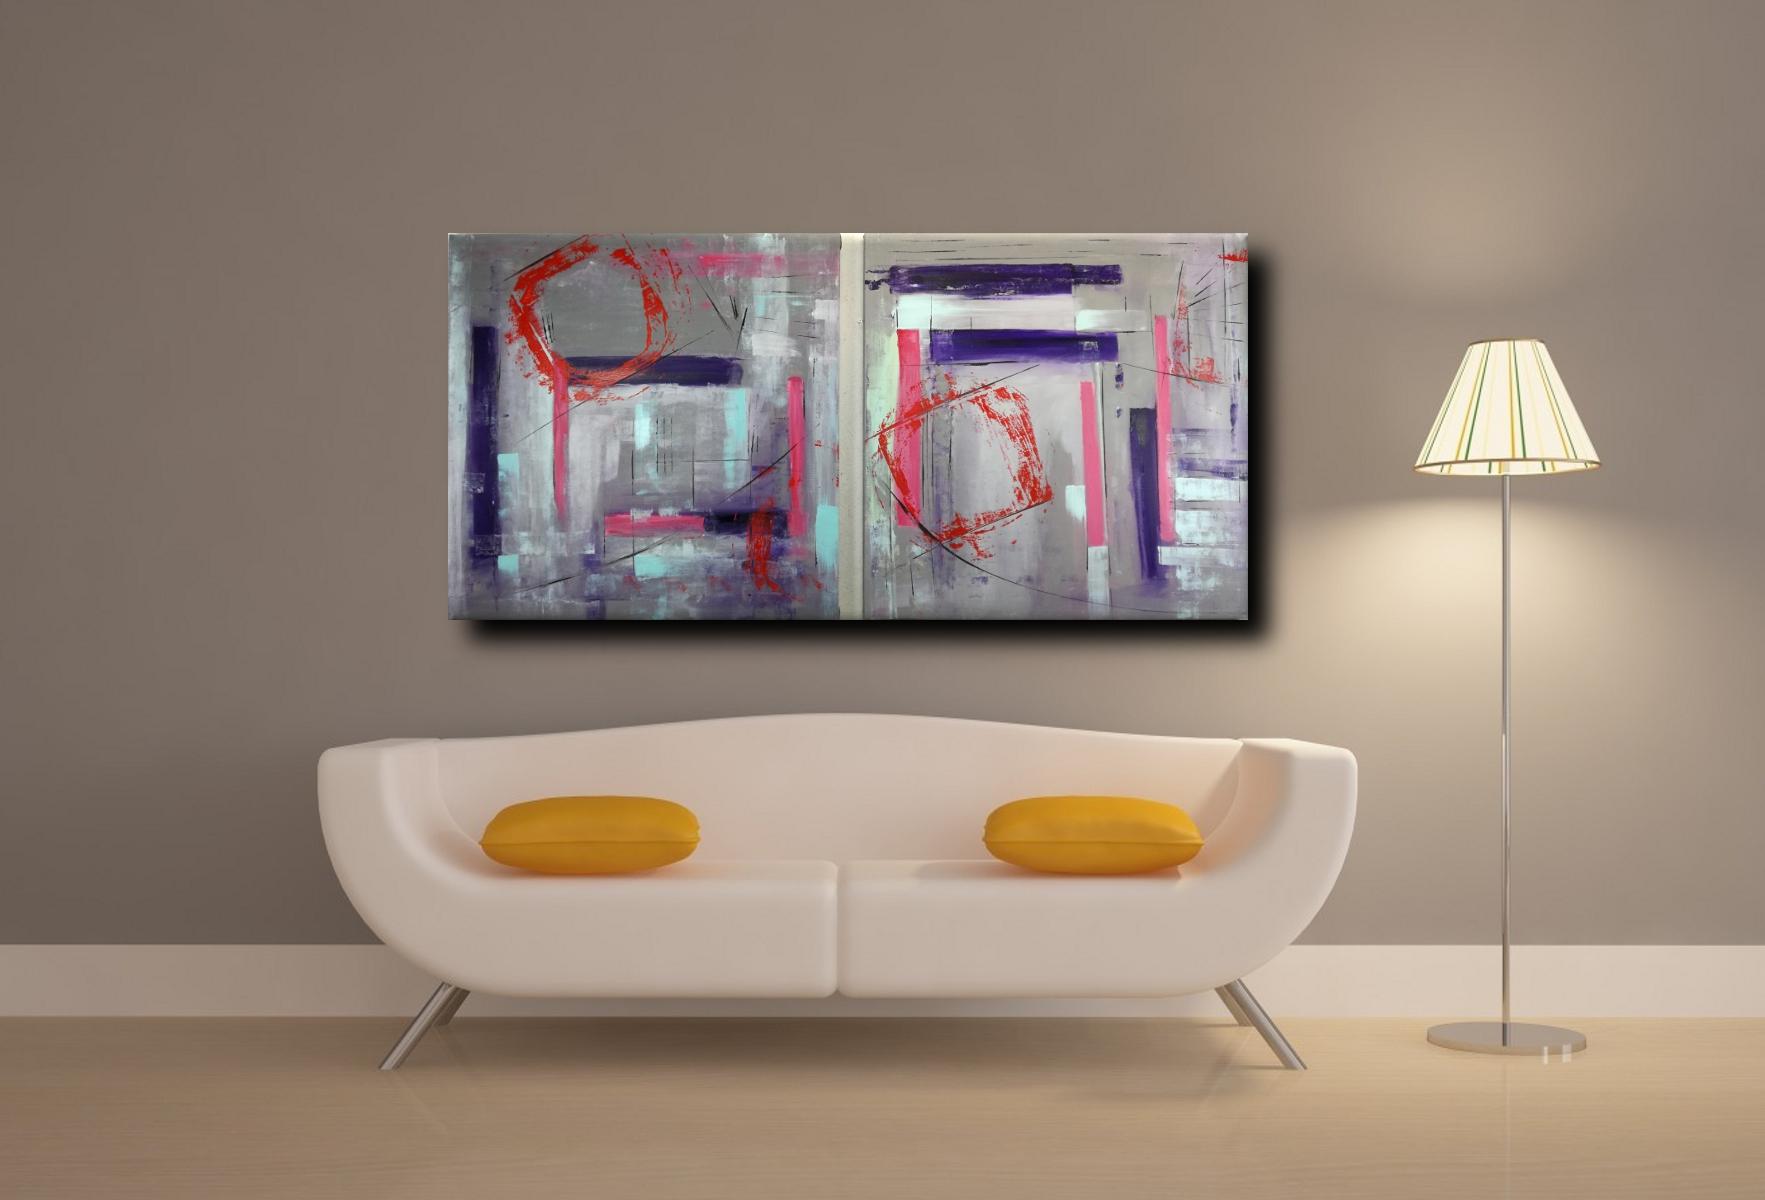 quadro astratto geometrico due tele 100x100x4 cm sauro bos. Black Bedroom Furniture Sets. Home Design Ideas